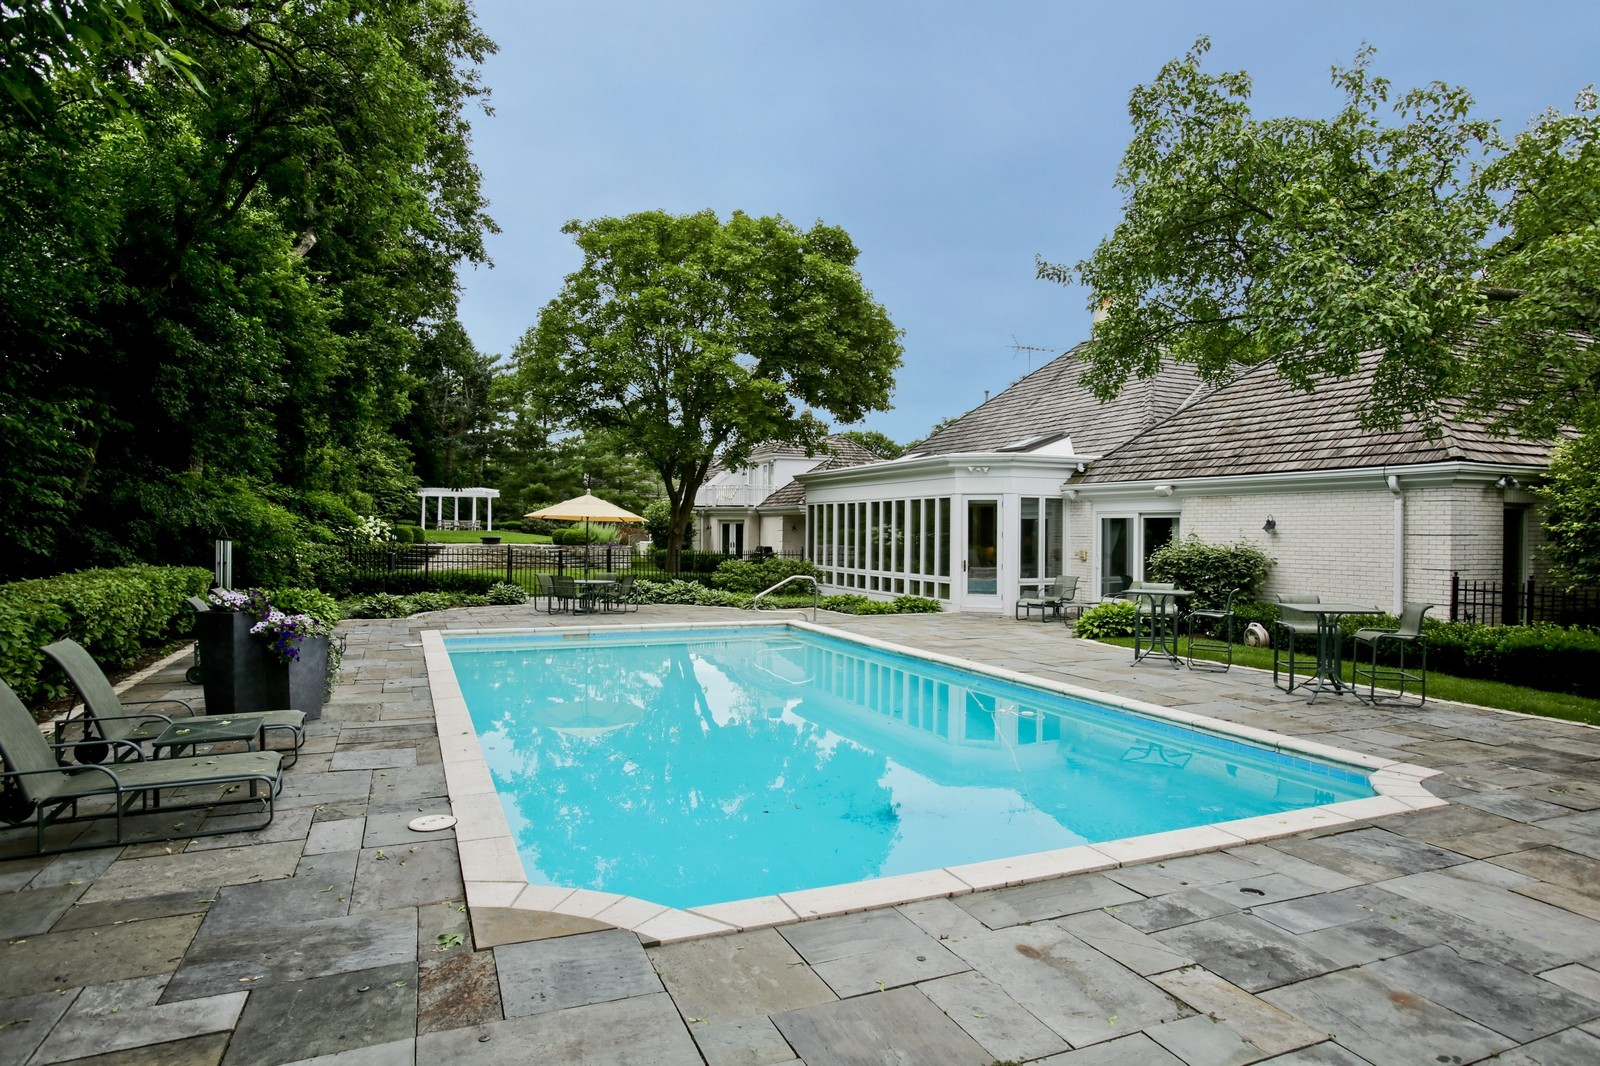 Real Estate Photography - 25W445 Plamondon Rd, Wheaton, IL, 60189 - Pool Area and Terrace